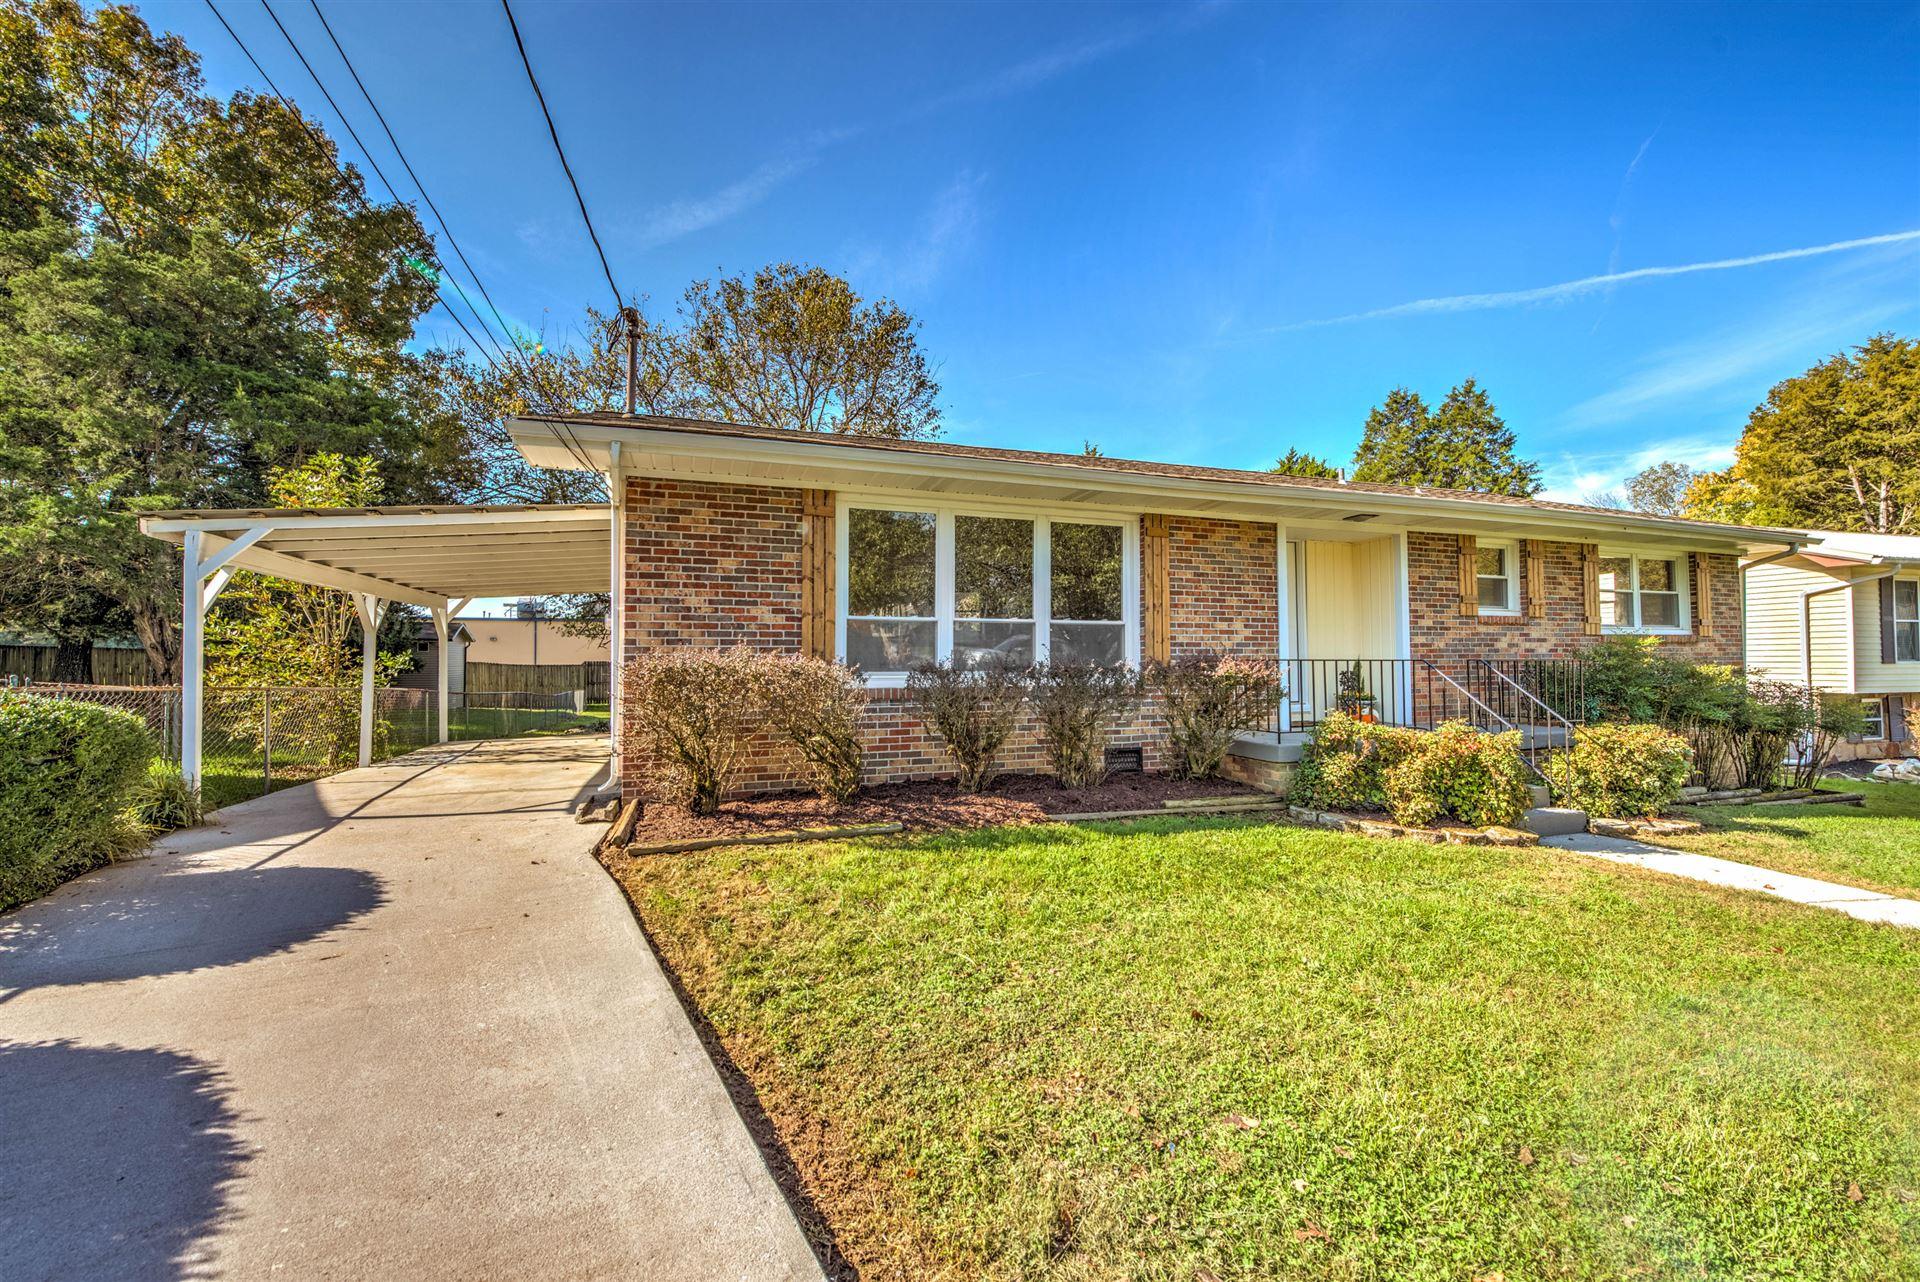 Photo of 3847 Debonair Drive, Knoxville, TN 37912 (MLS # 1133339)